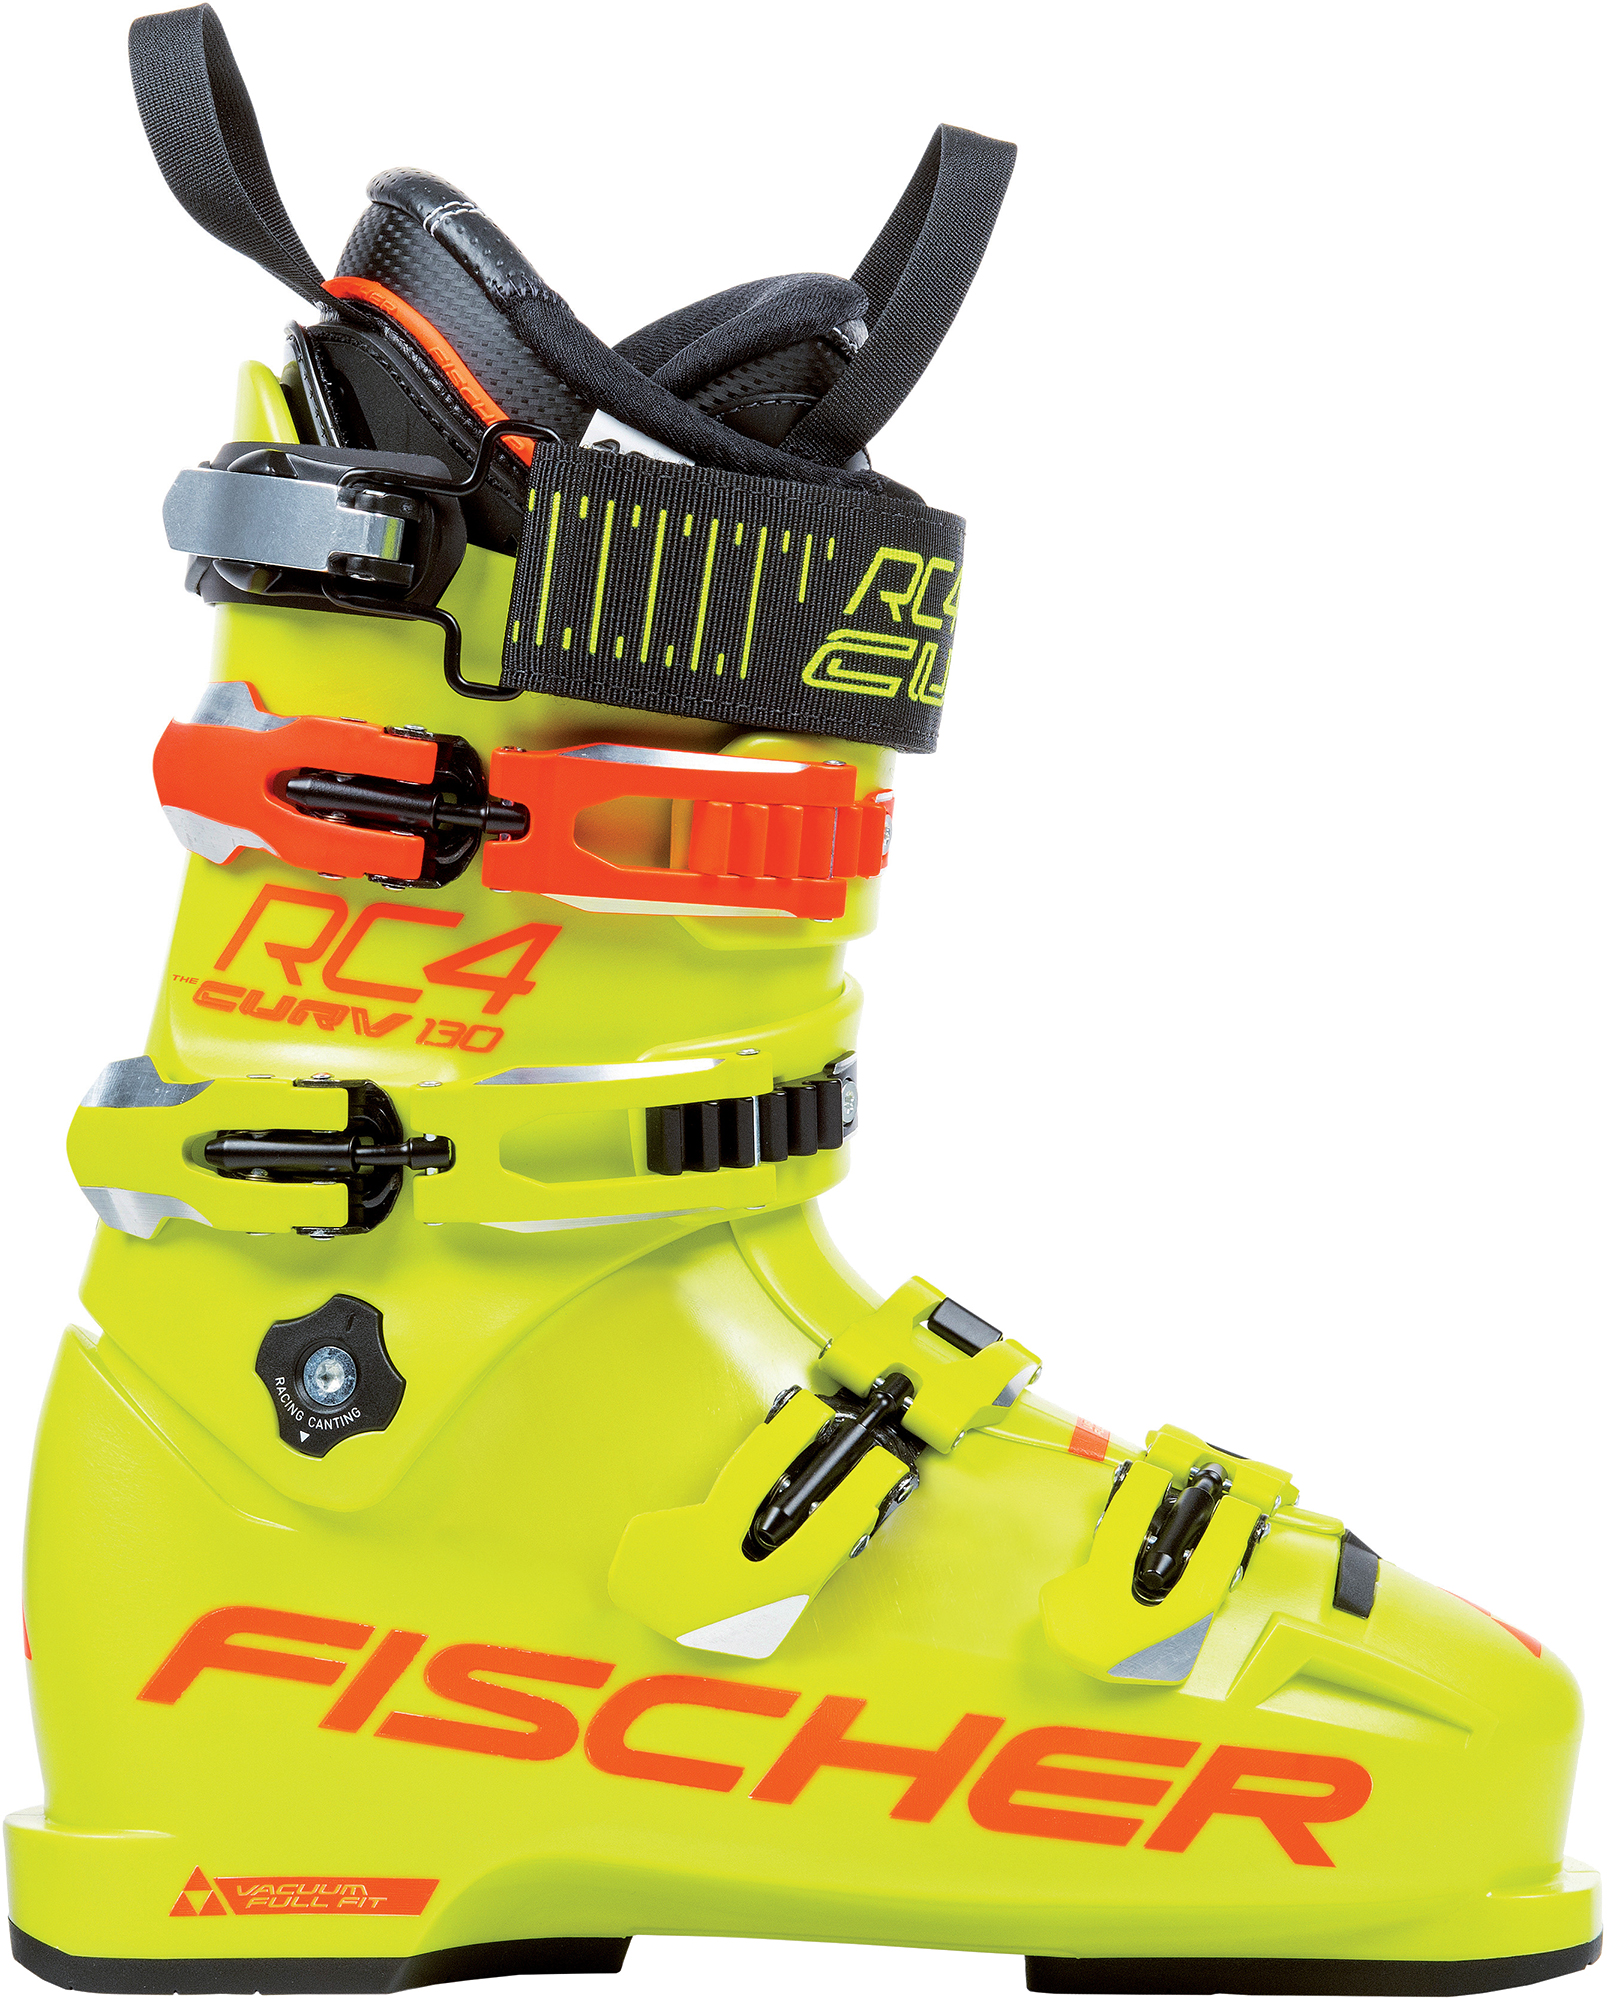 Fischer Ботинки горнолыжные Fischer Rc4 Curv 130 Vacuum Full Fit, размер 45